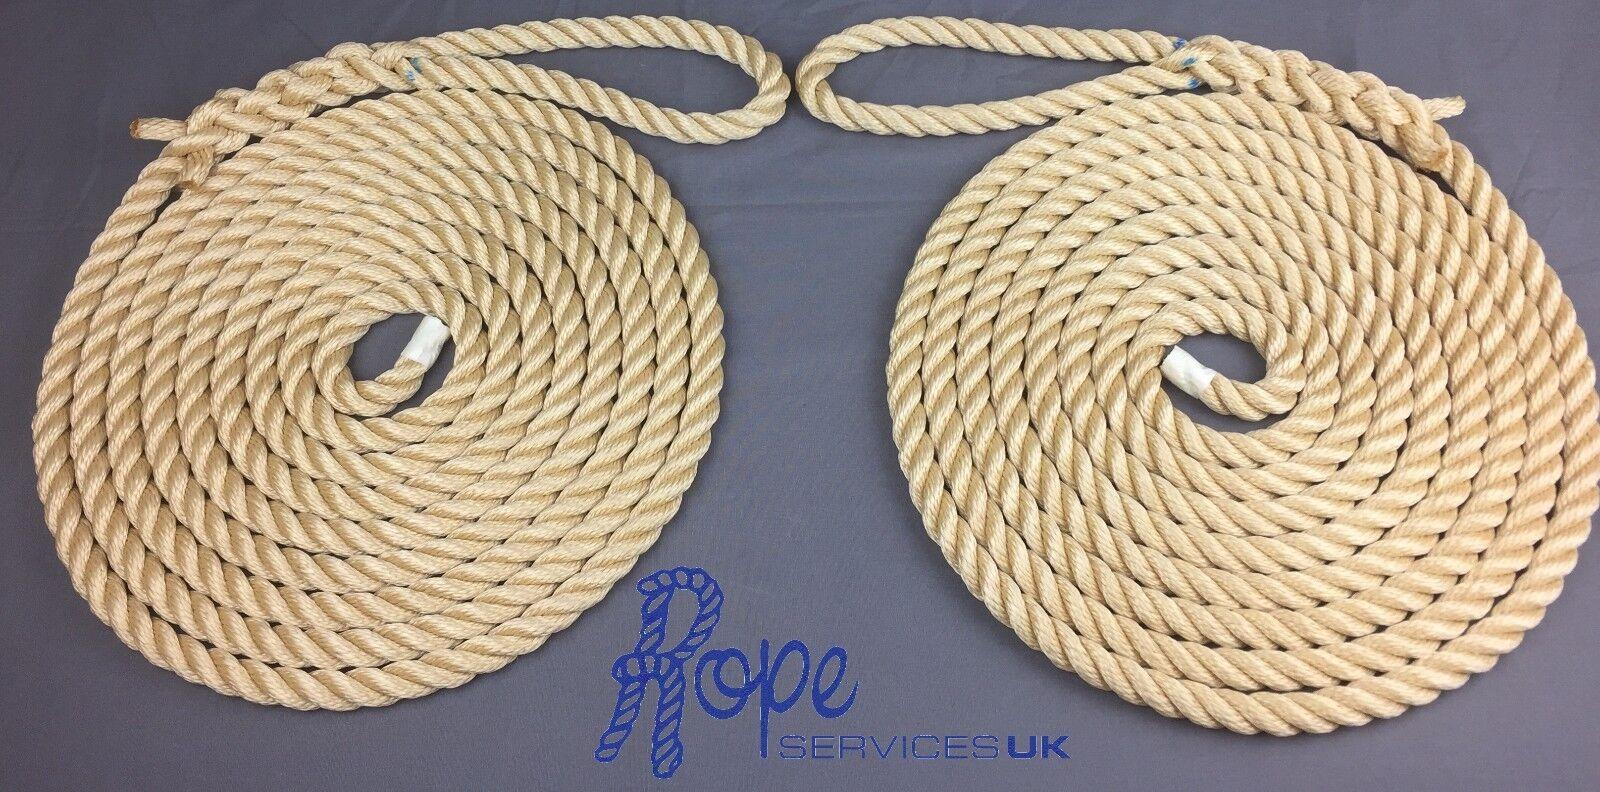 12mm Beige Mooring Ropes, 2 x 12 Metres, Softline, Warps, Boat Lines, Yachts